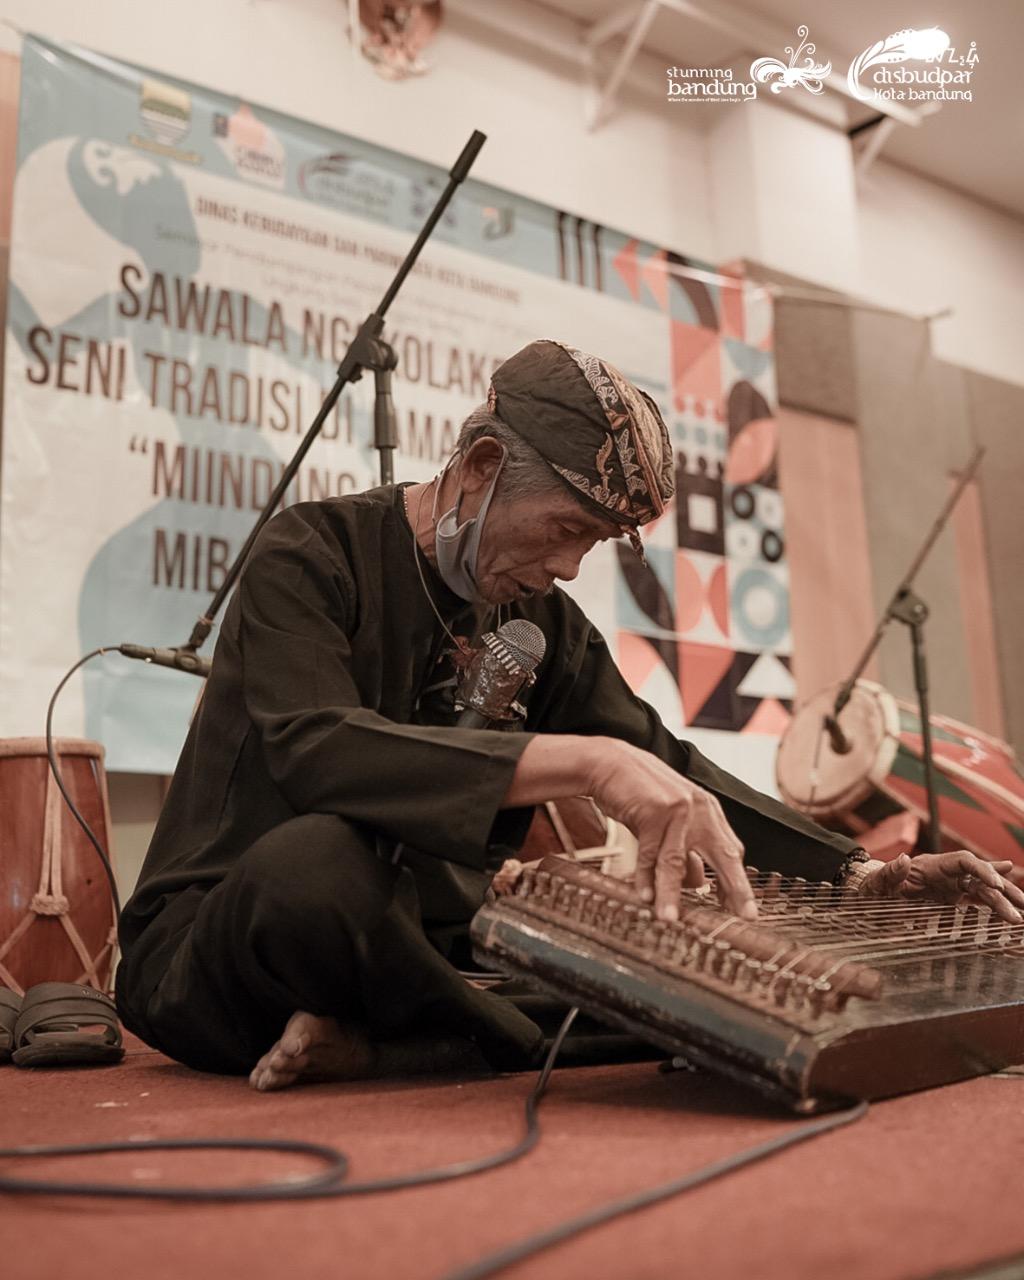 Kegiatan Pelatihan Manajemen Budaya untuk Sanggar dan Lingkung Seni Kecamatan Cibiru